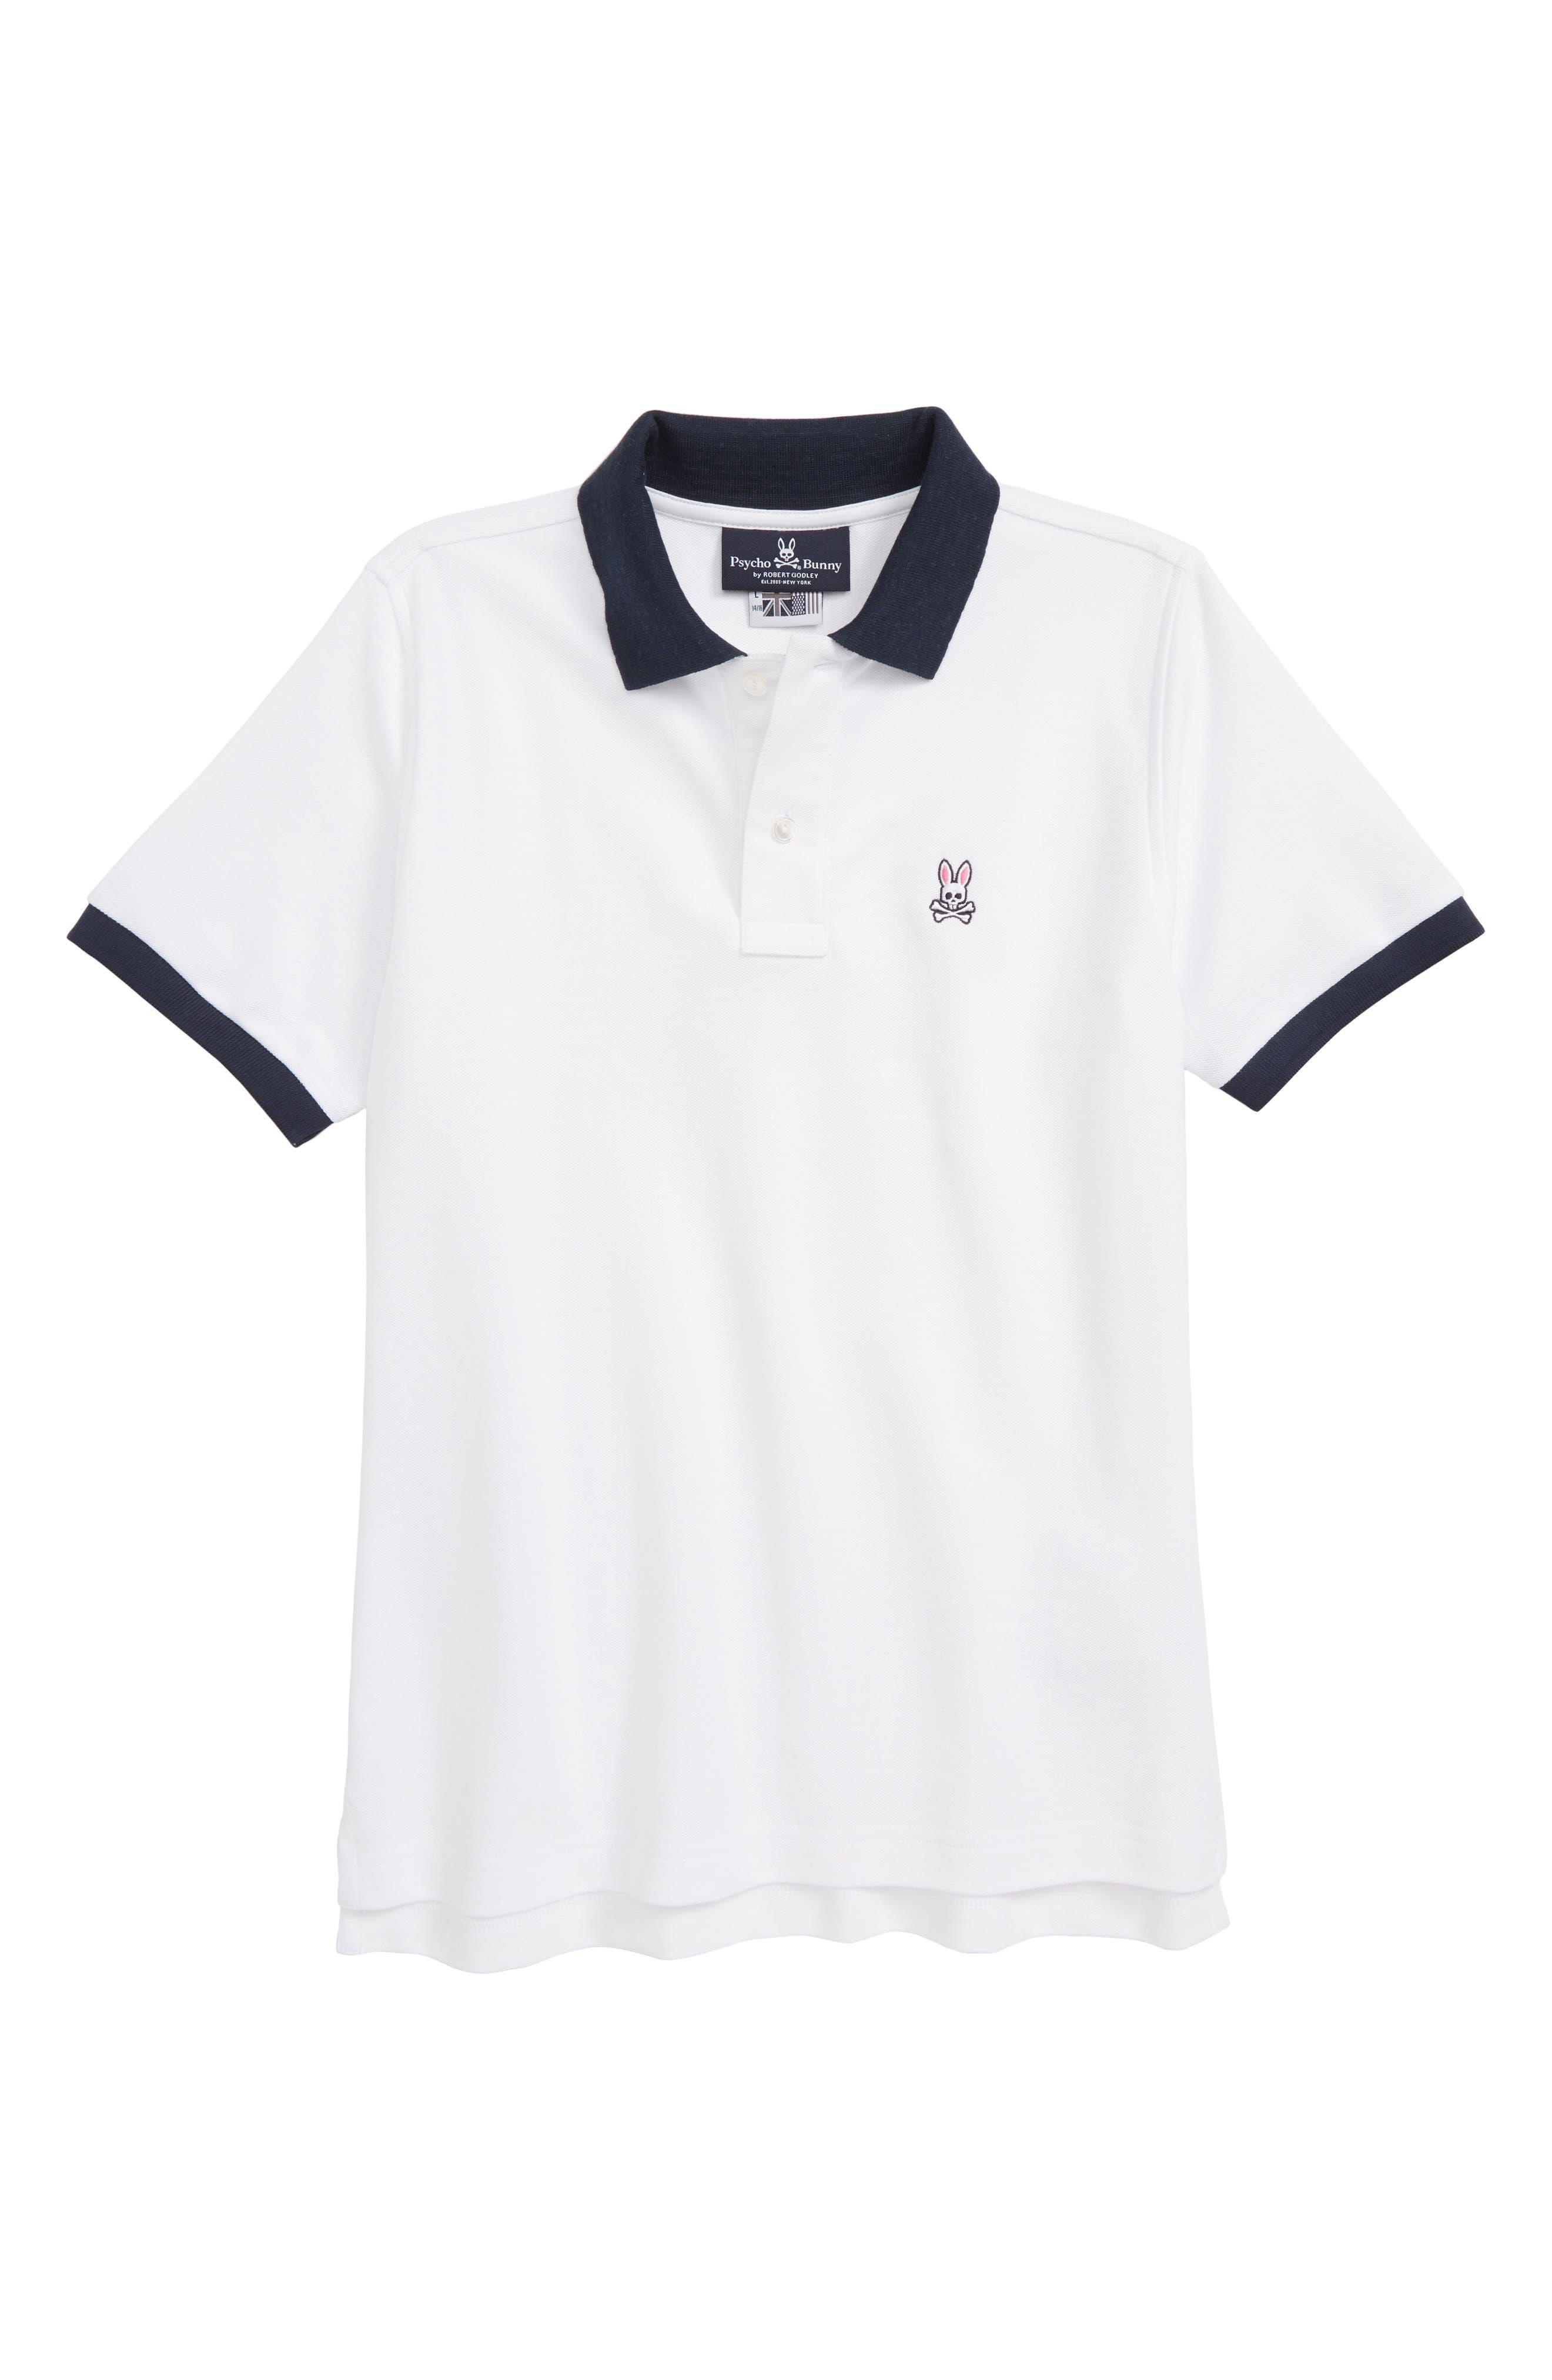 Thorpe Piqué Polo,                             Main thumbnail 1, color,                             WHITE